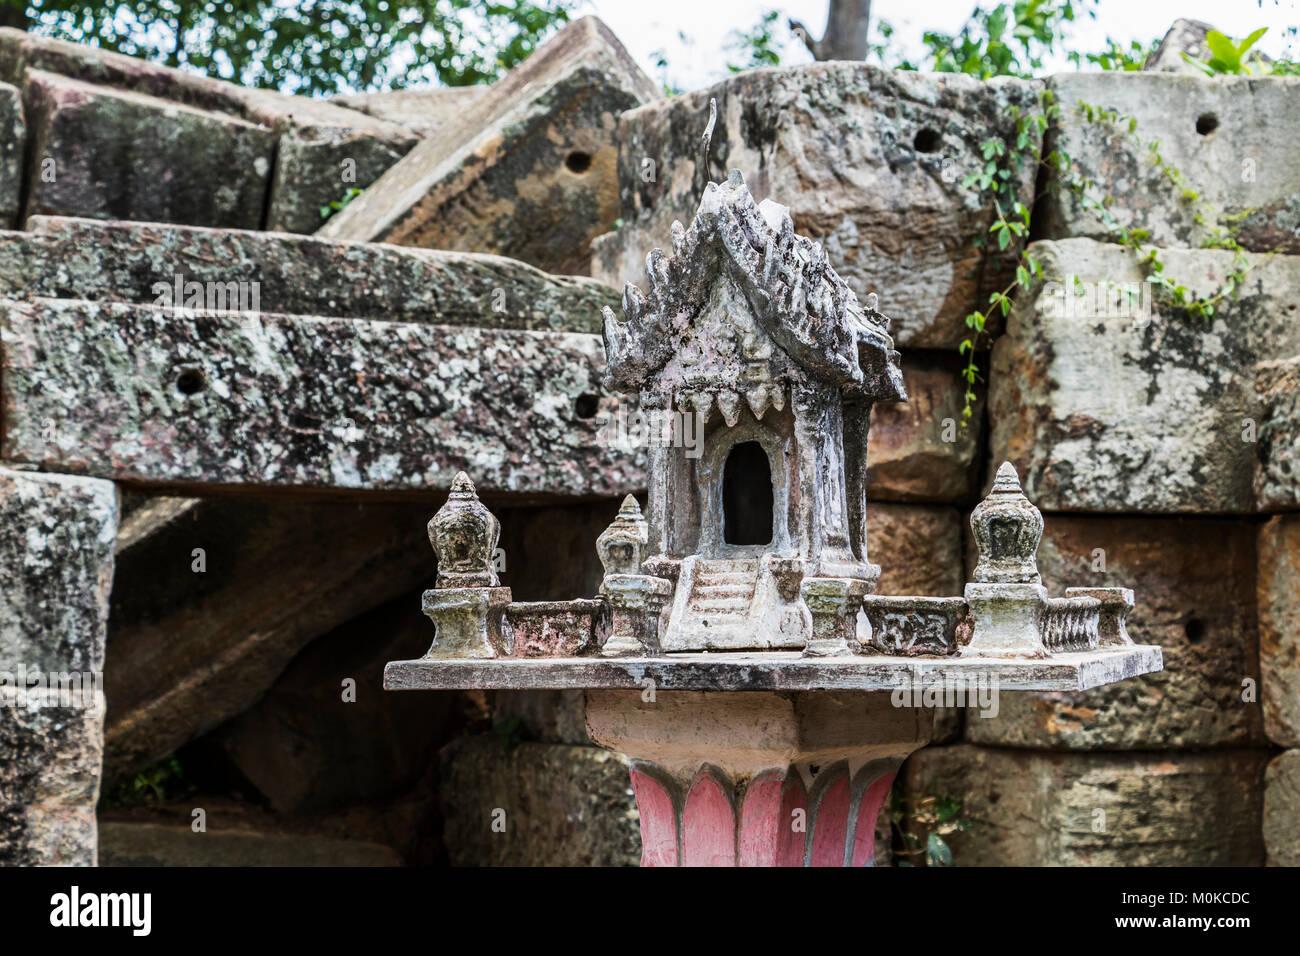 Spirit house by the ancient Angkorian temple at Wat Ek Phnom; Battambang, Cambodia - Stock Image